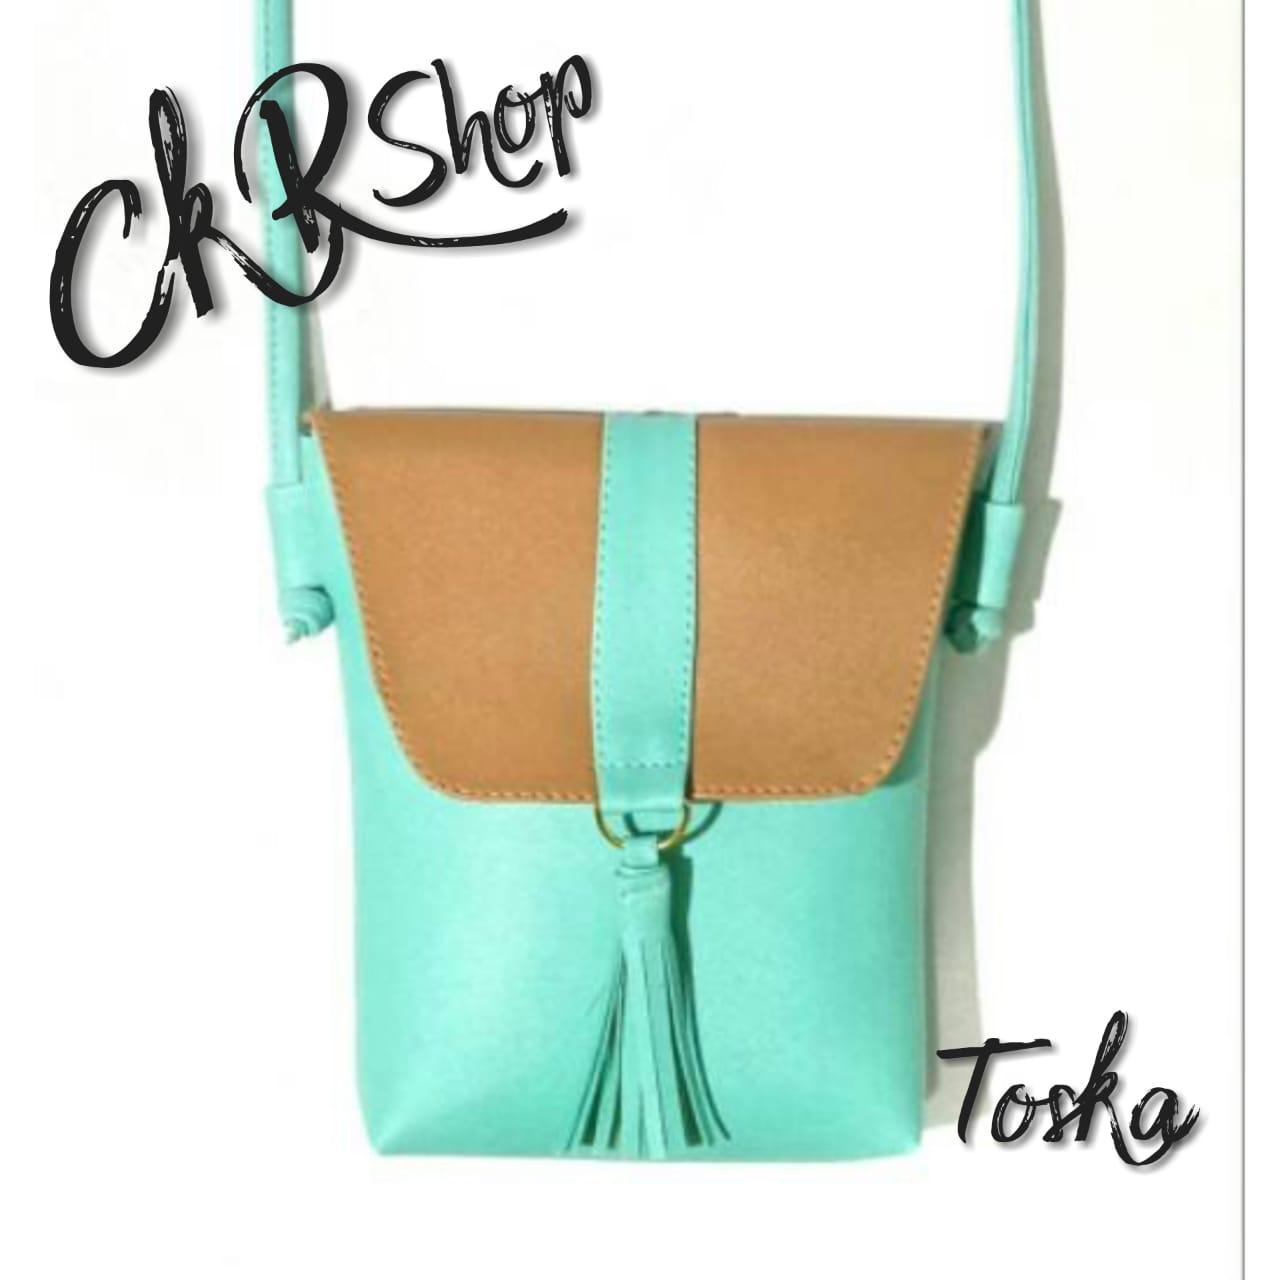 CkR Tas - Tania Mini Bags HR - 111 - 2